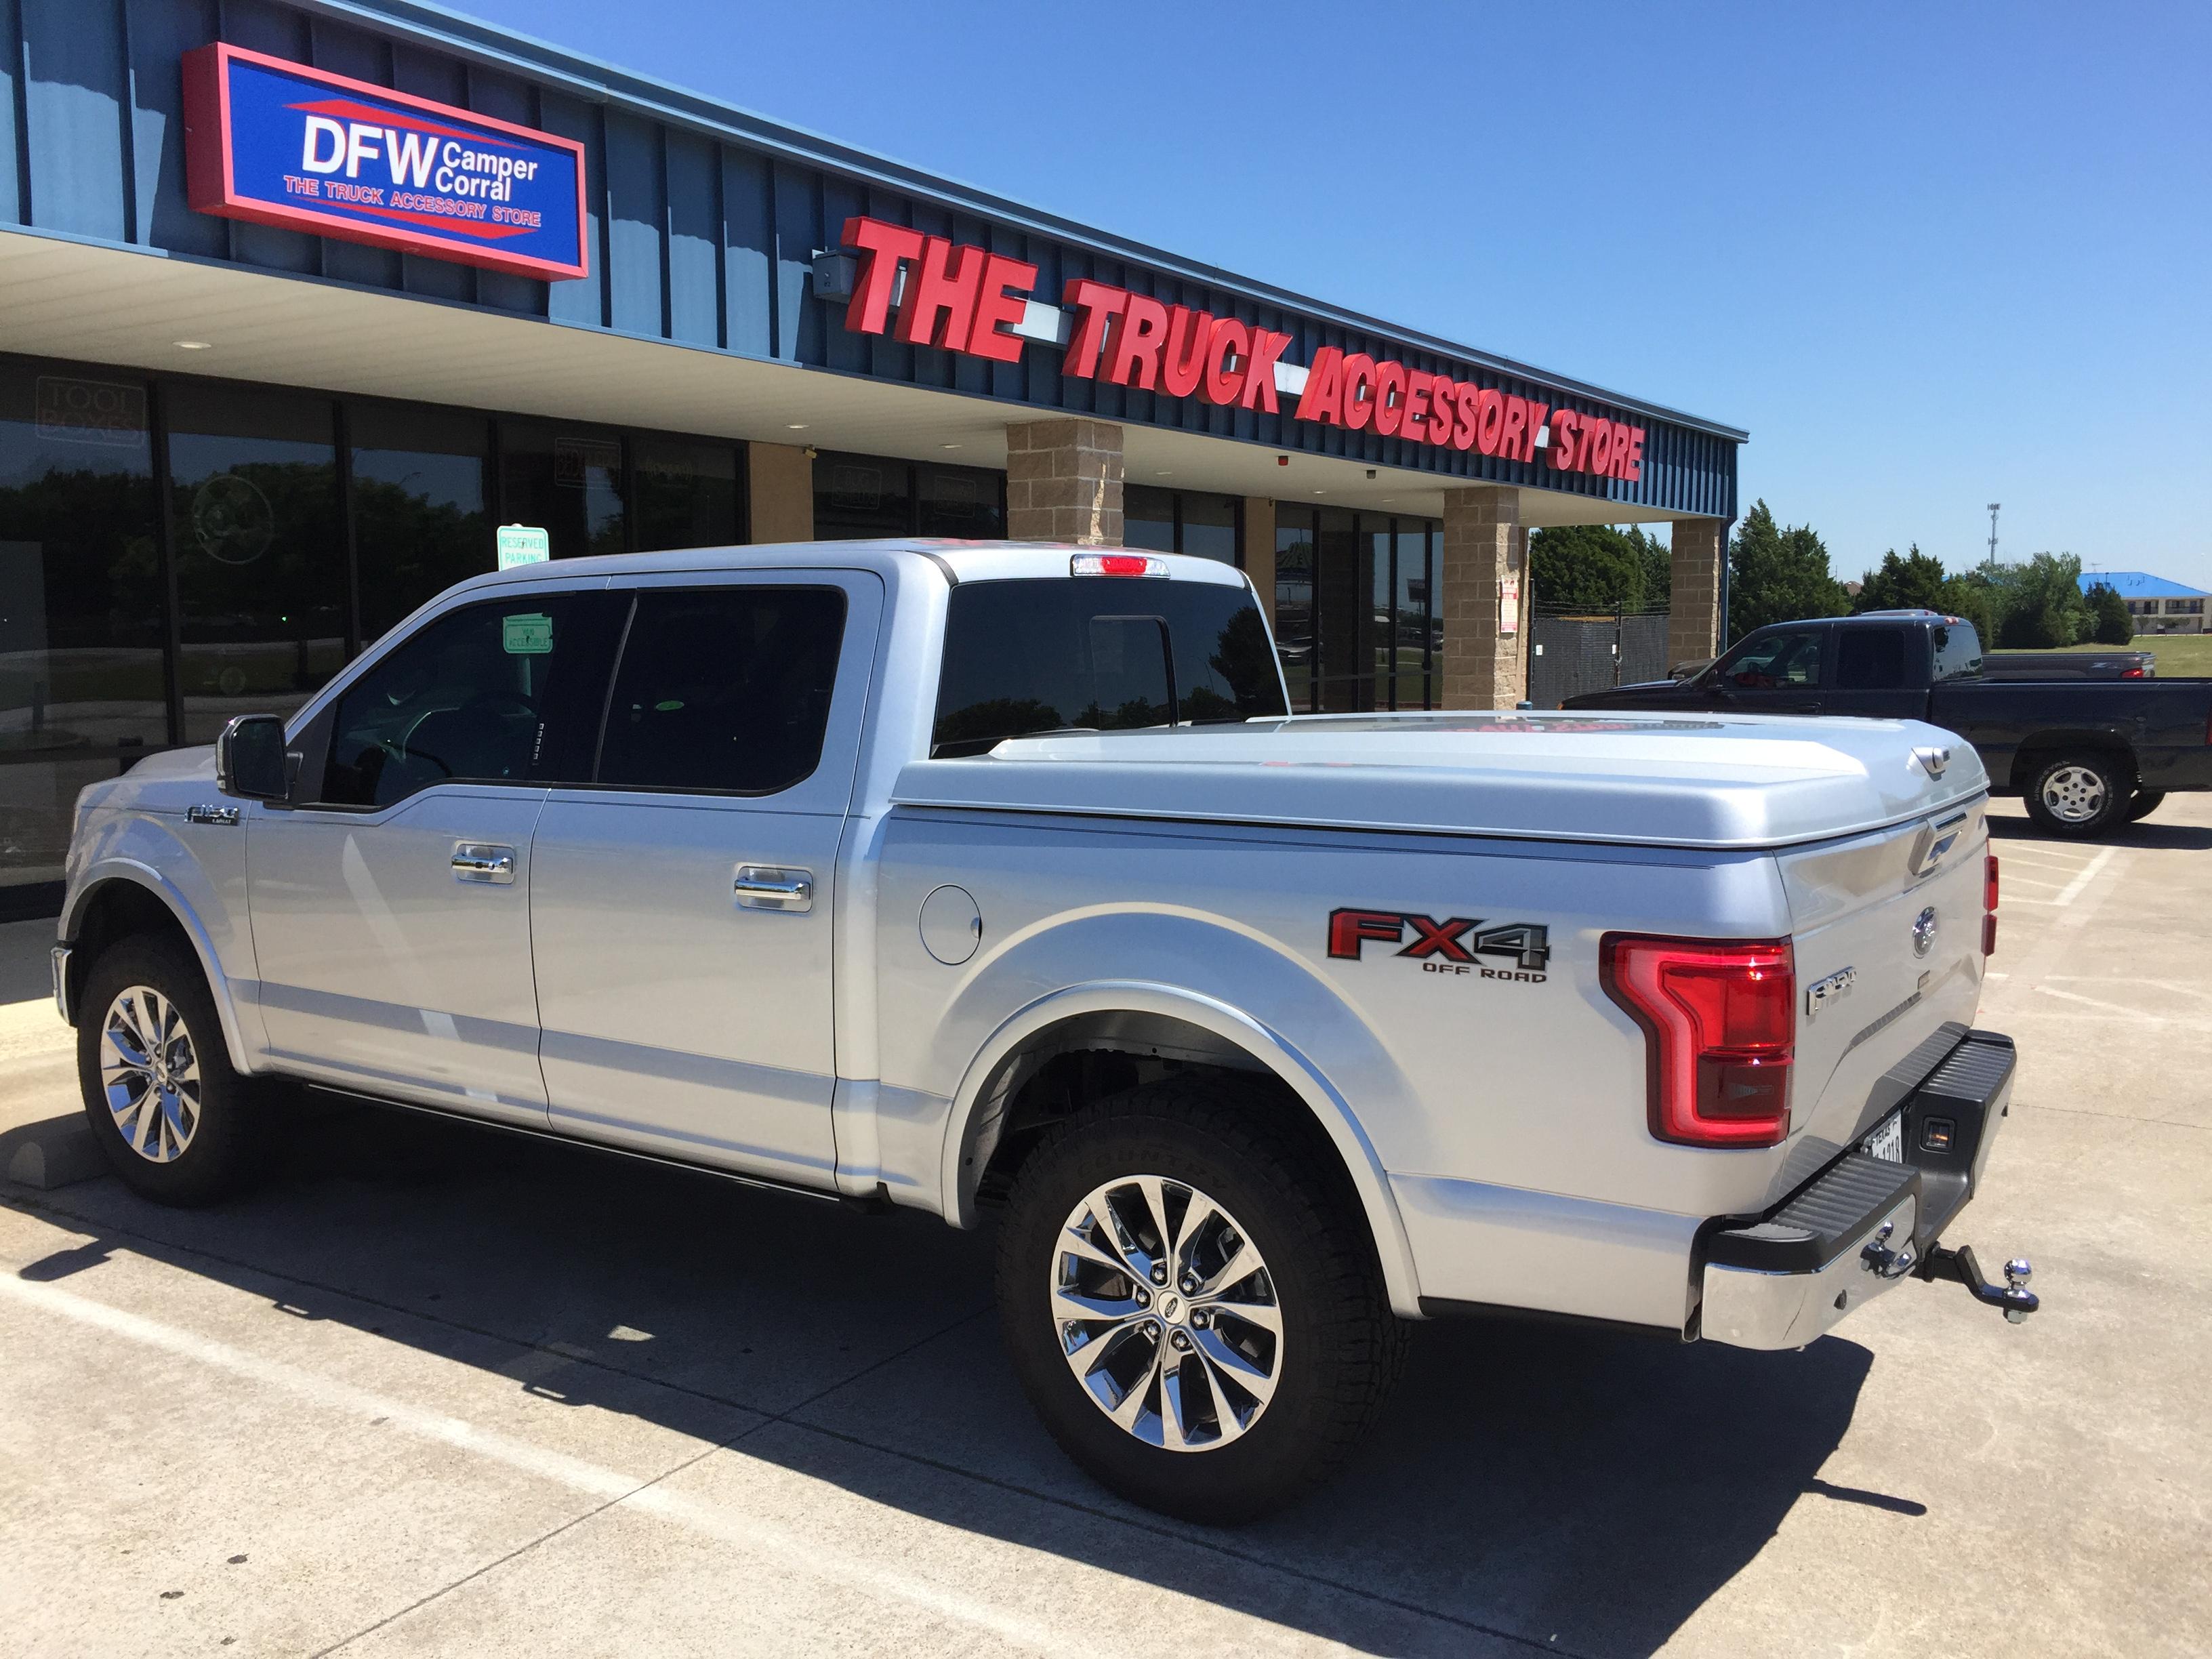 DFW Truck & Auto Accessories